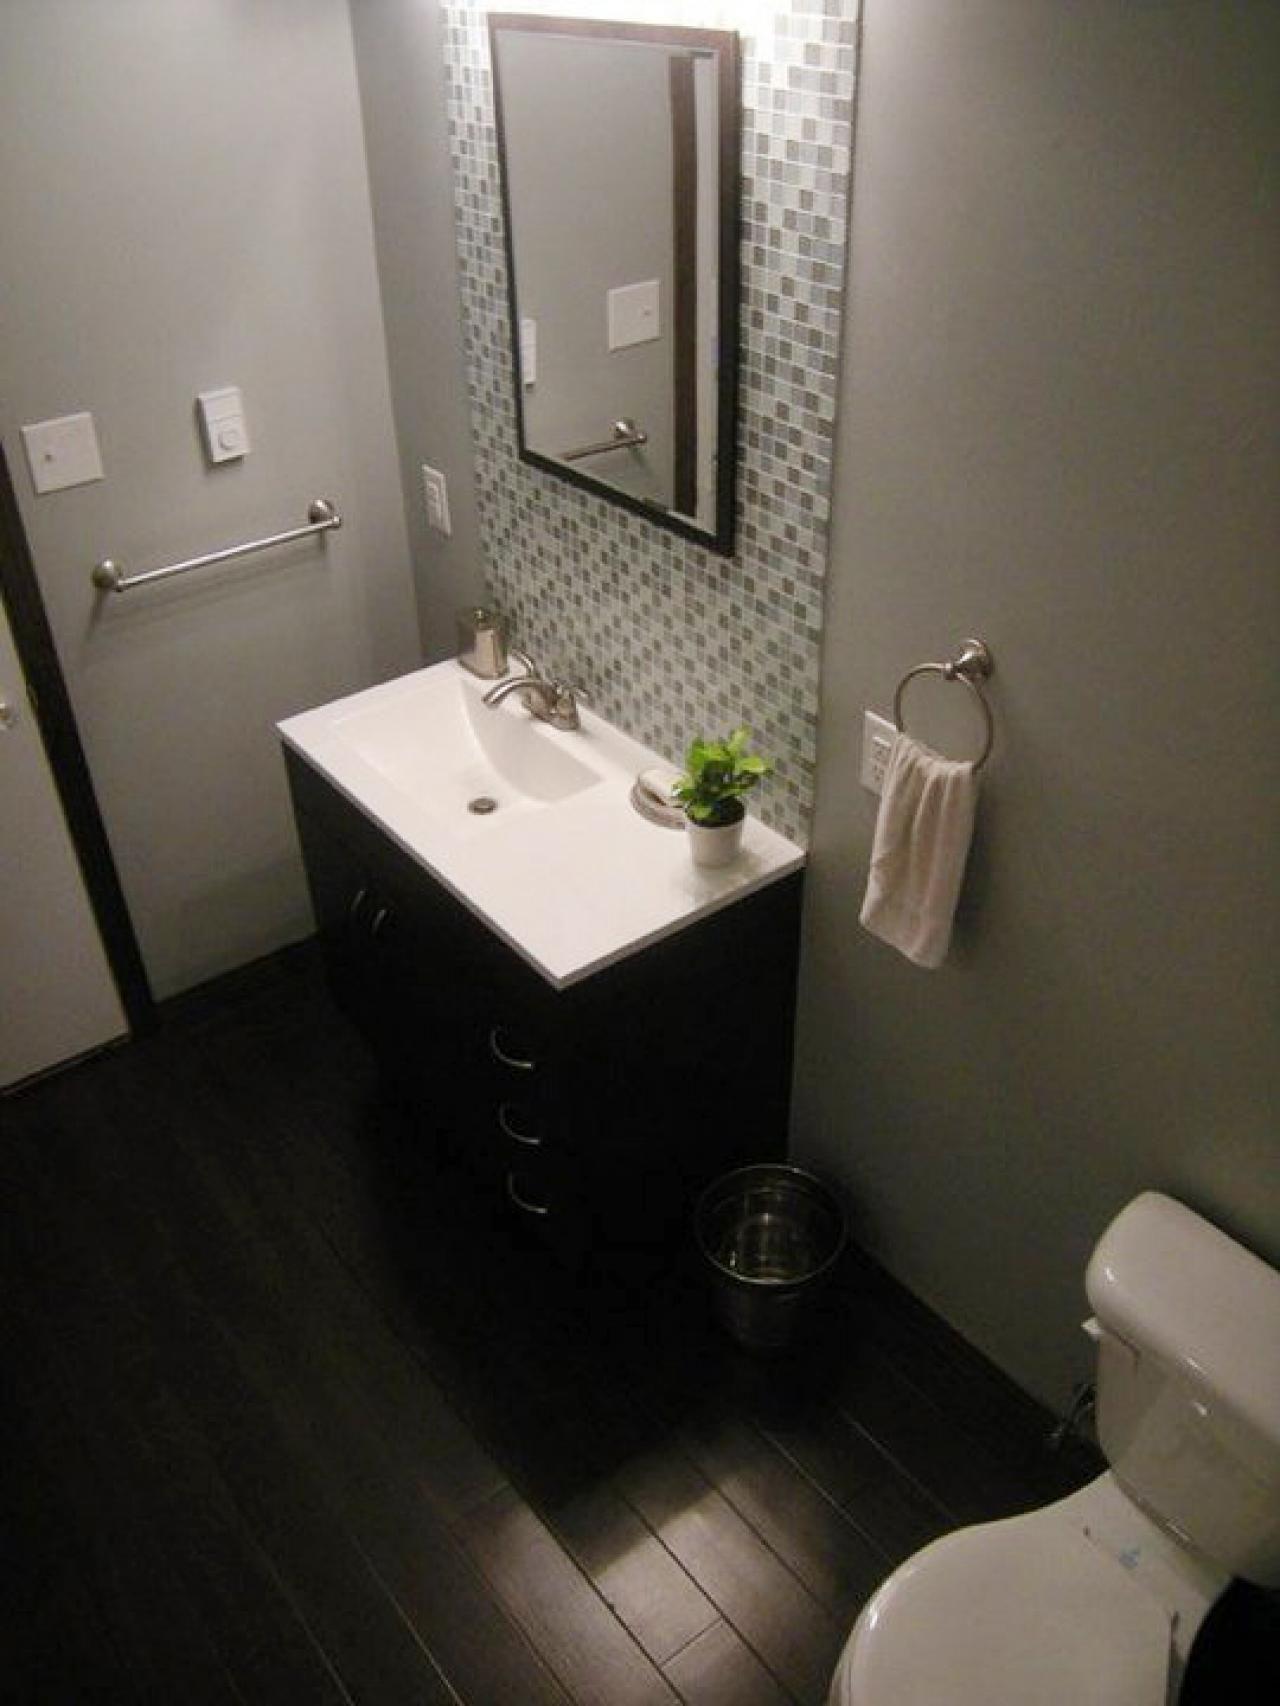 Small Bathroom Designs On A Budget Budgeting For A Bathroom Remodel  Budget Bathroom Remodel Budget